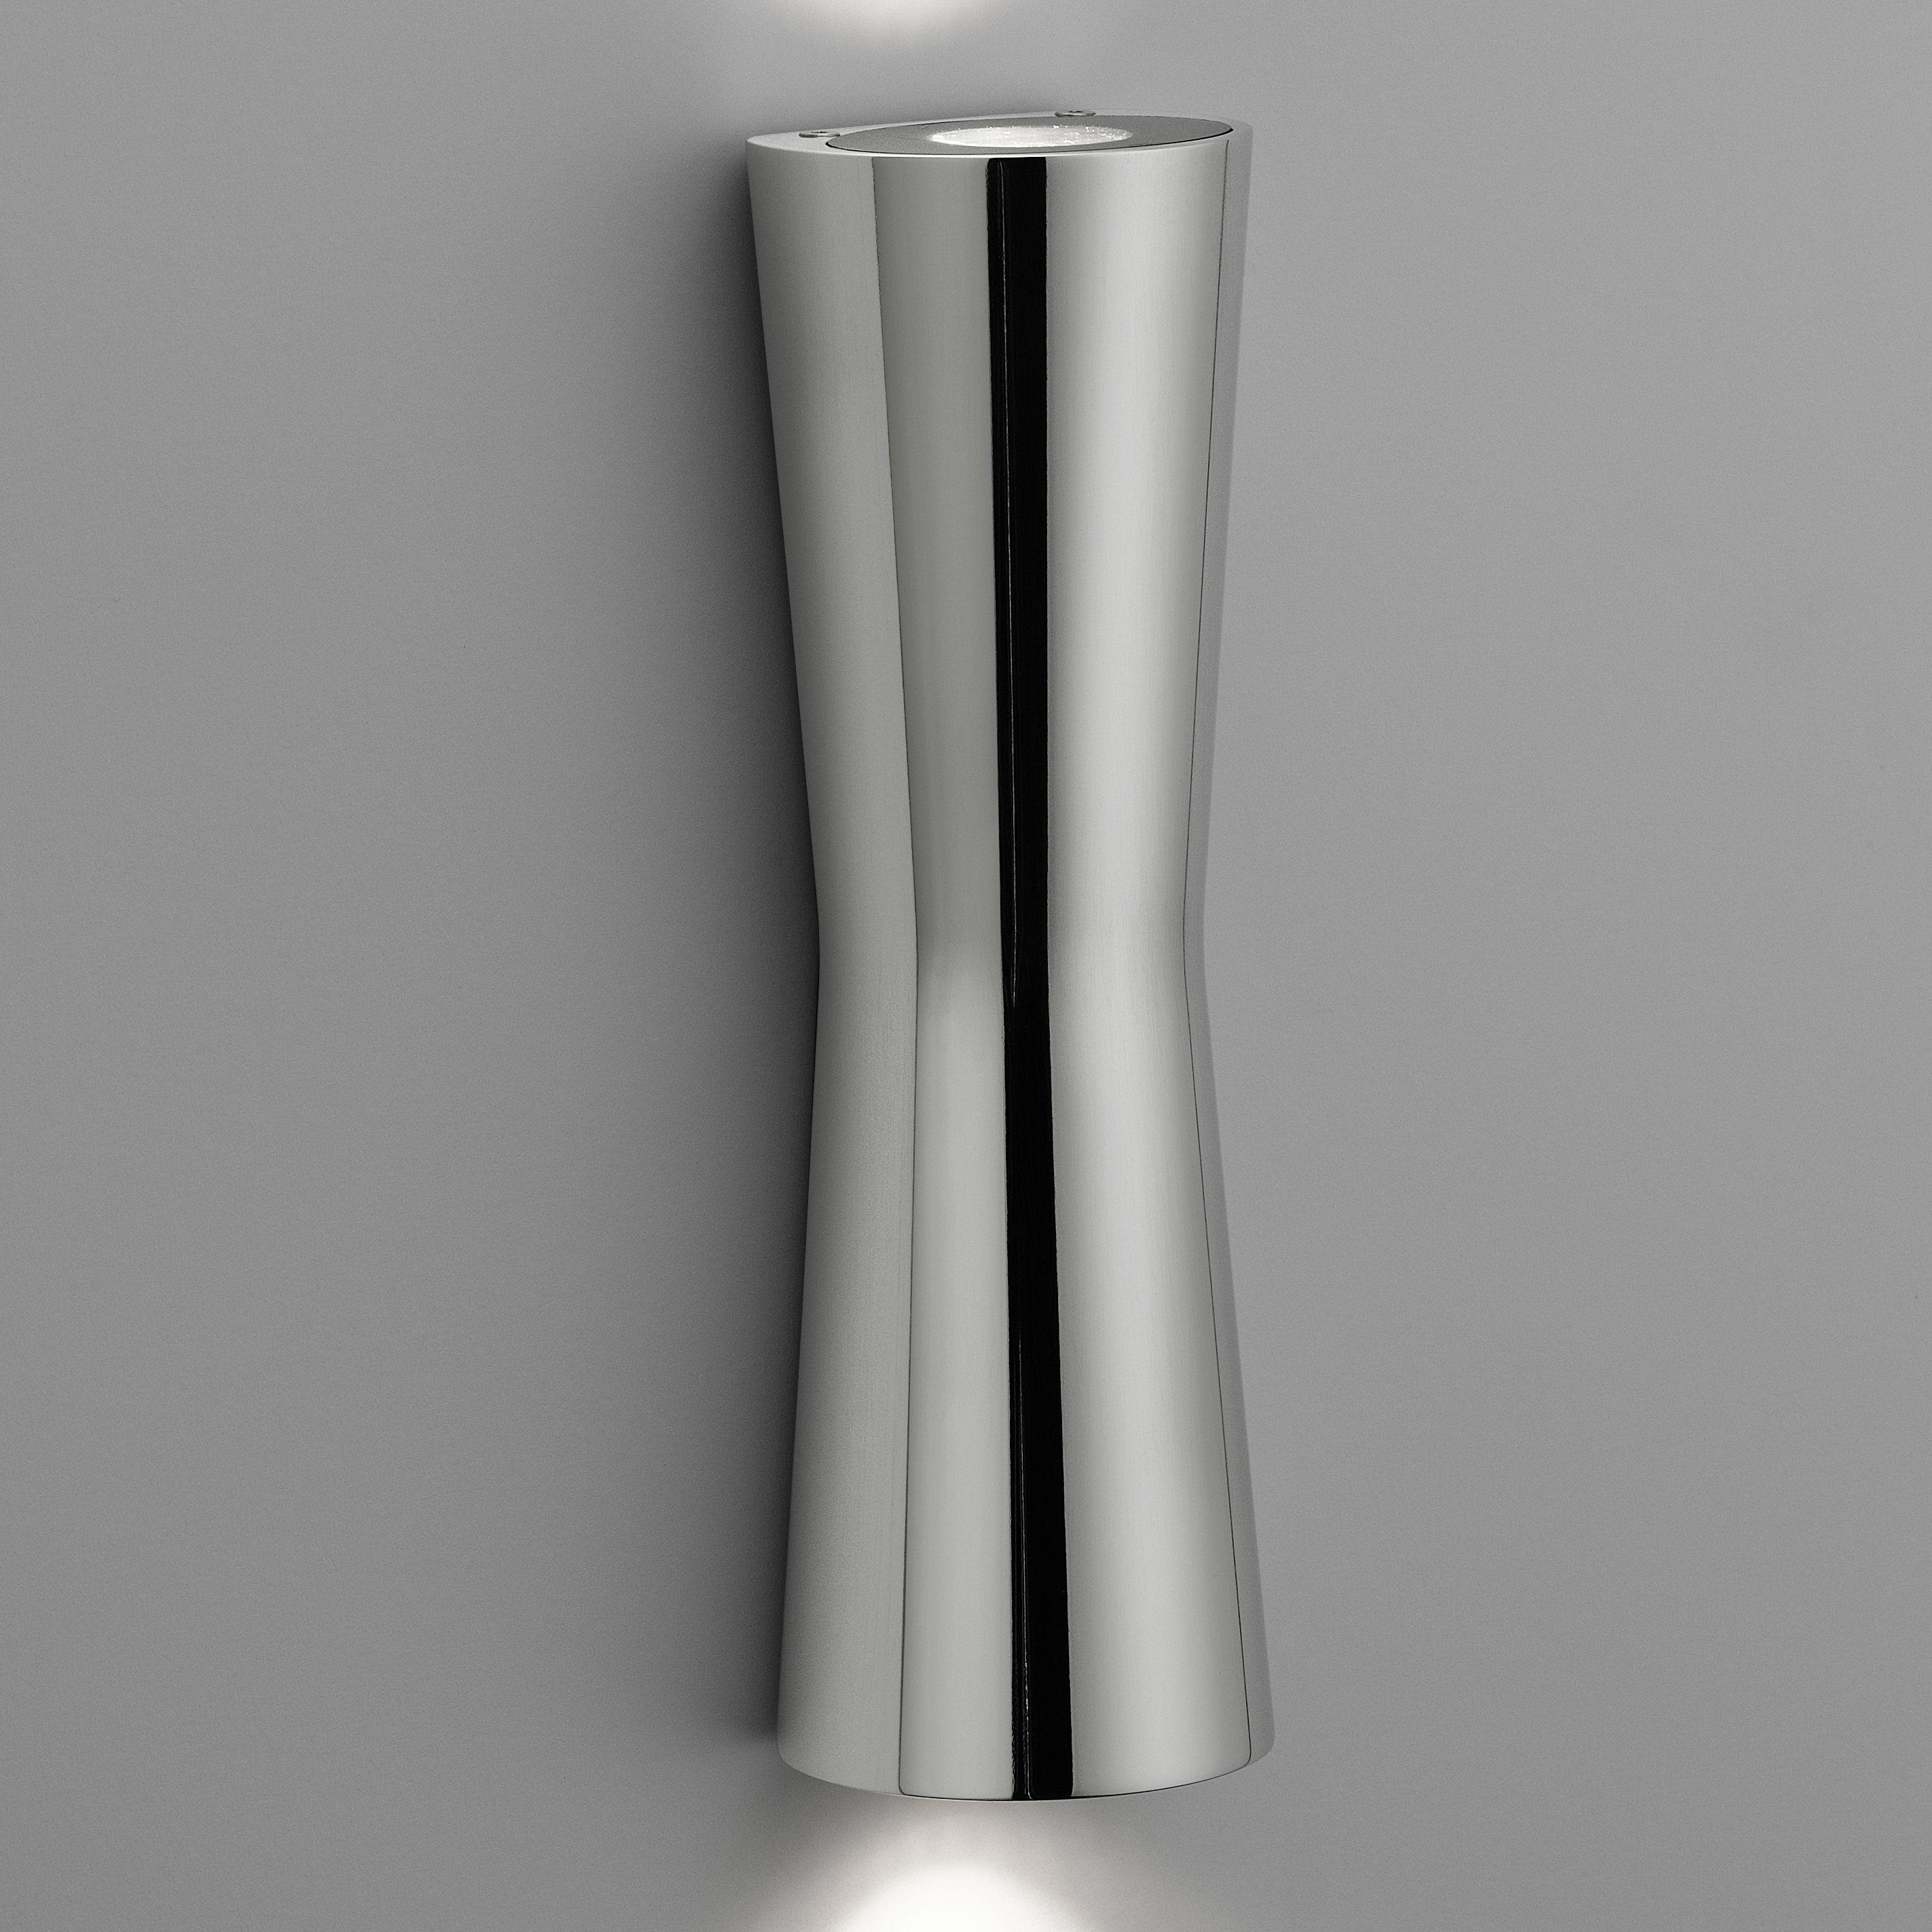 Lighting - Wall Lights - Clessidra 20° Wall light - LED - Indoor by Flos - Chromed - Cast aluminium, PMMA